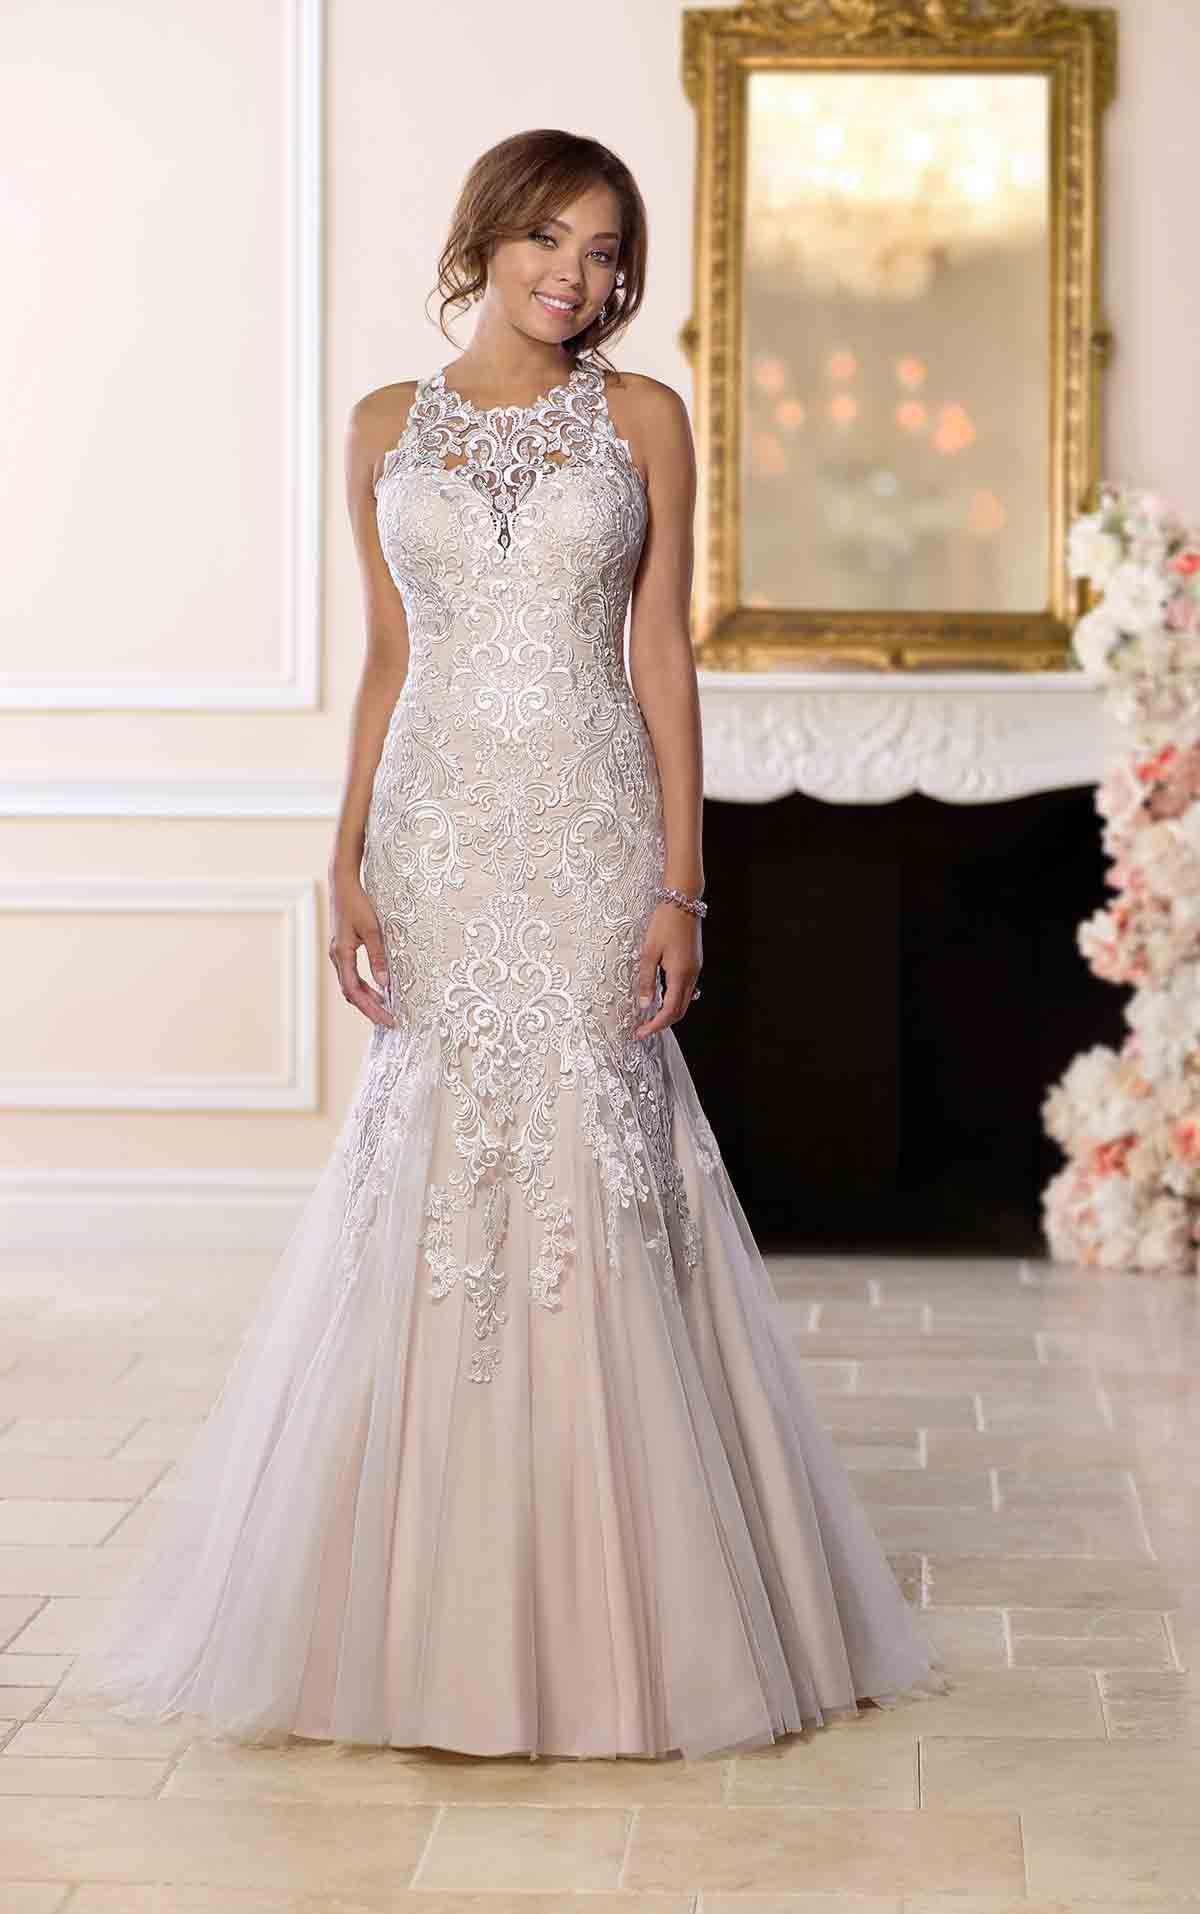 Mermaid Wedding Dress With Halter Neckline Stella York Wedding Dress York Wedding Dress Mermaid Dresses [ 1914 x 1200 Pixel ]